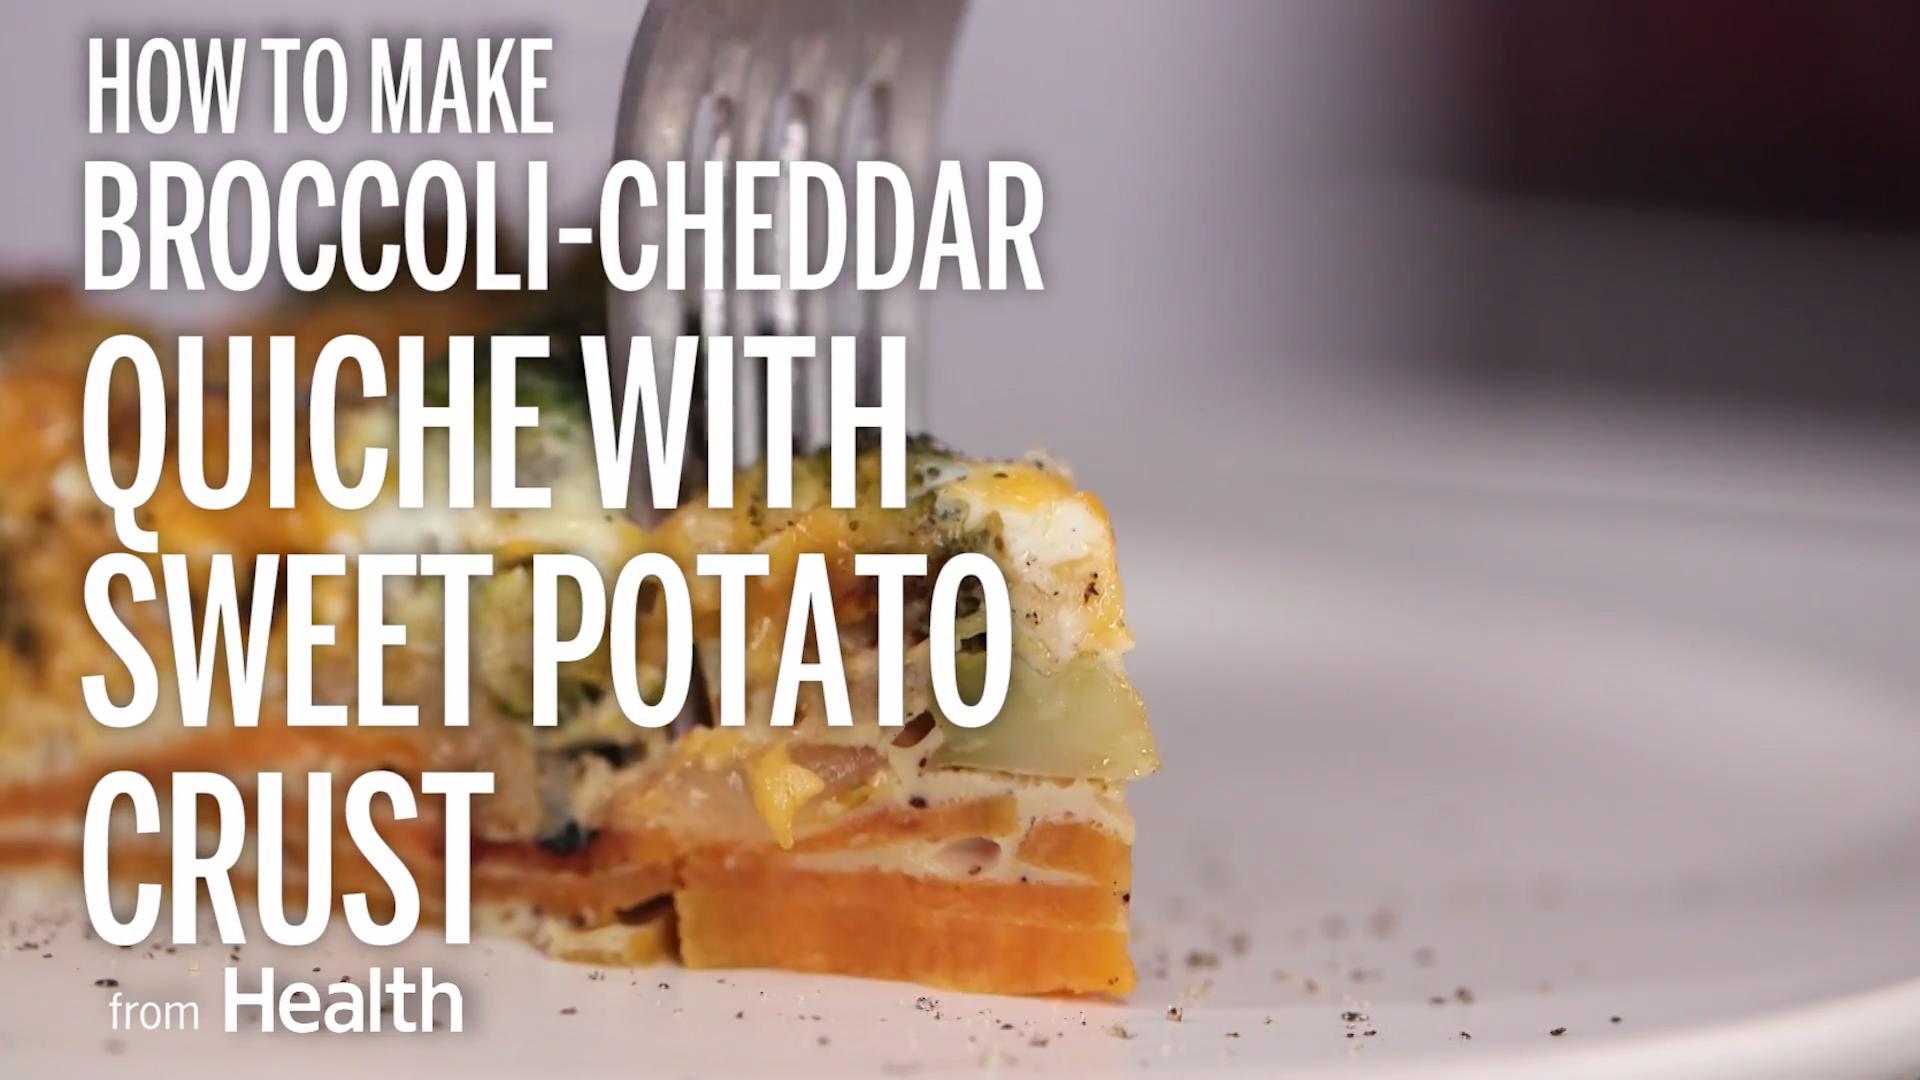 Broccoli-Cheddar Quiche With Sweet Potato Crust